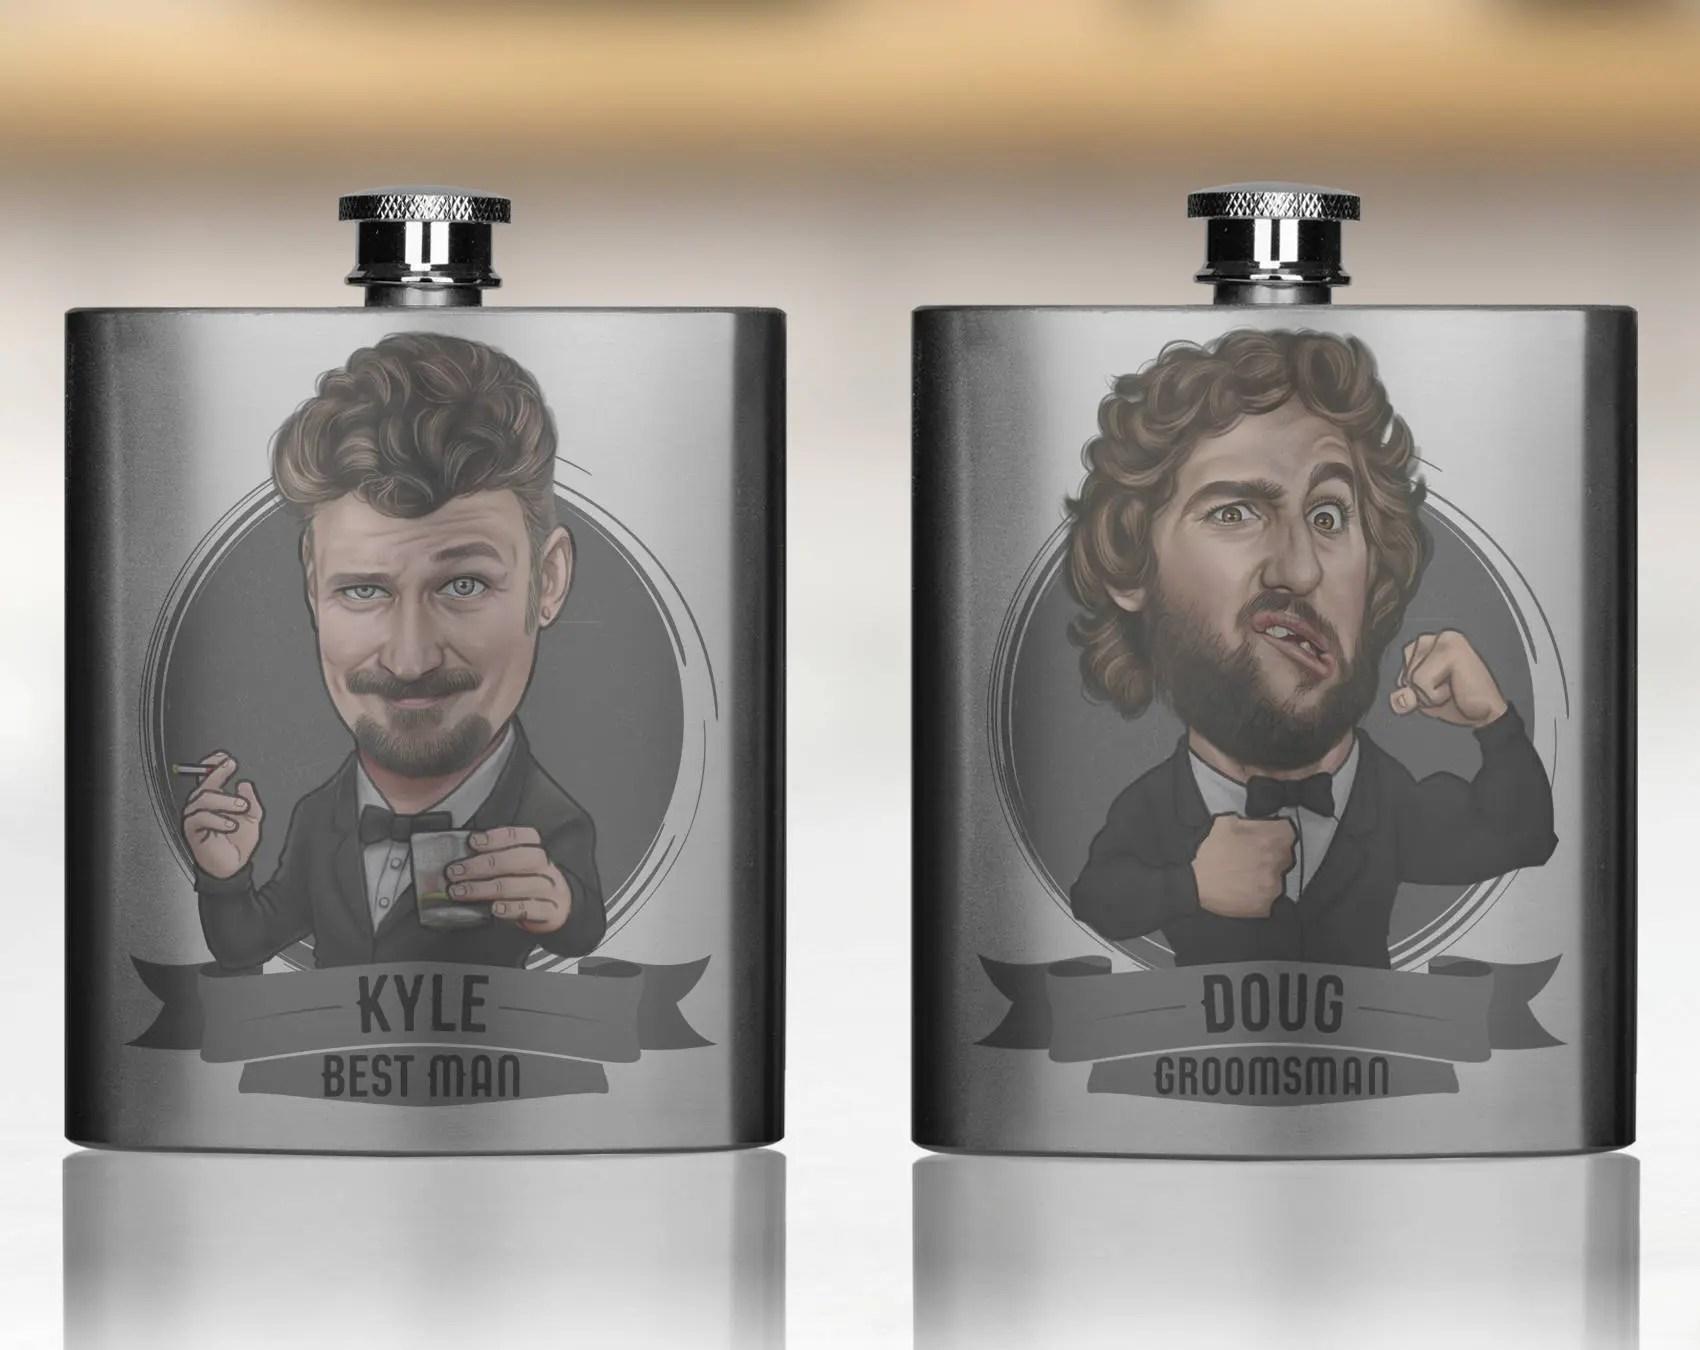 zAzdzzzzz                                                                                                                                                                                    Groomsmen Gift, Groomsmen Flasks, Groomsmen Gifts, Personalized Groomsmen Flasks, Custom Flasks, Flask For Groomsmen, Groomsman Gift                                                                    ToonedUpGifts                               5 out of 5 stars                                                                                                                                                                                                                                                          (5,503)                                                      CA$54.24                                                              Bestseller